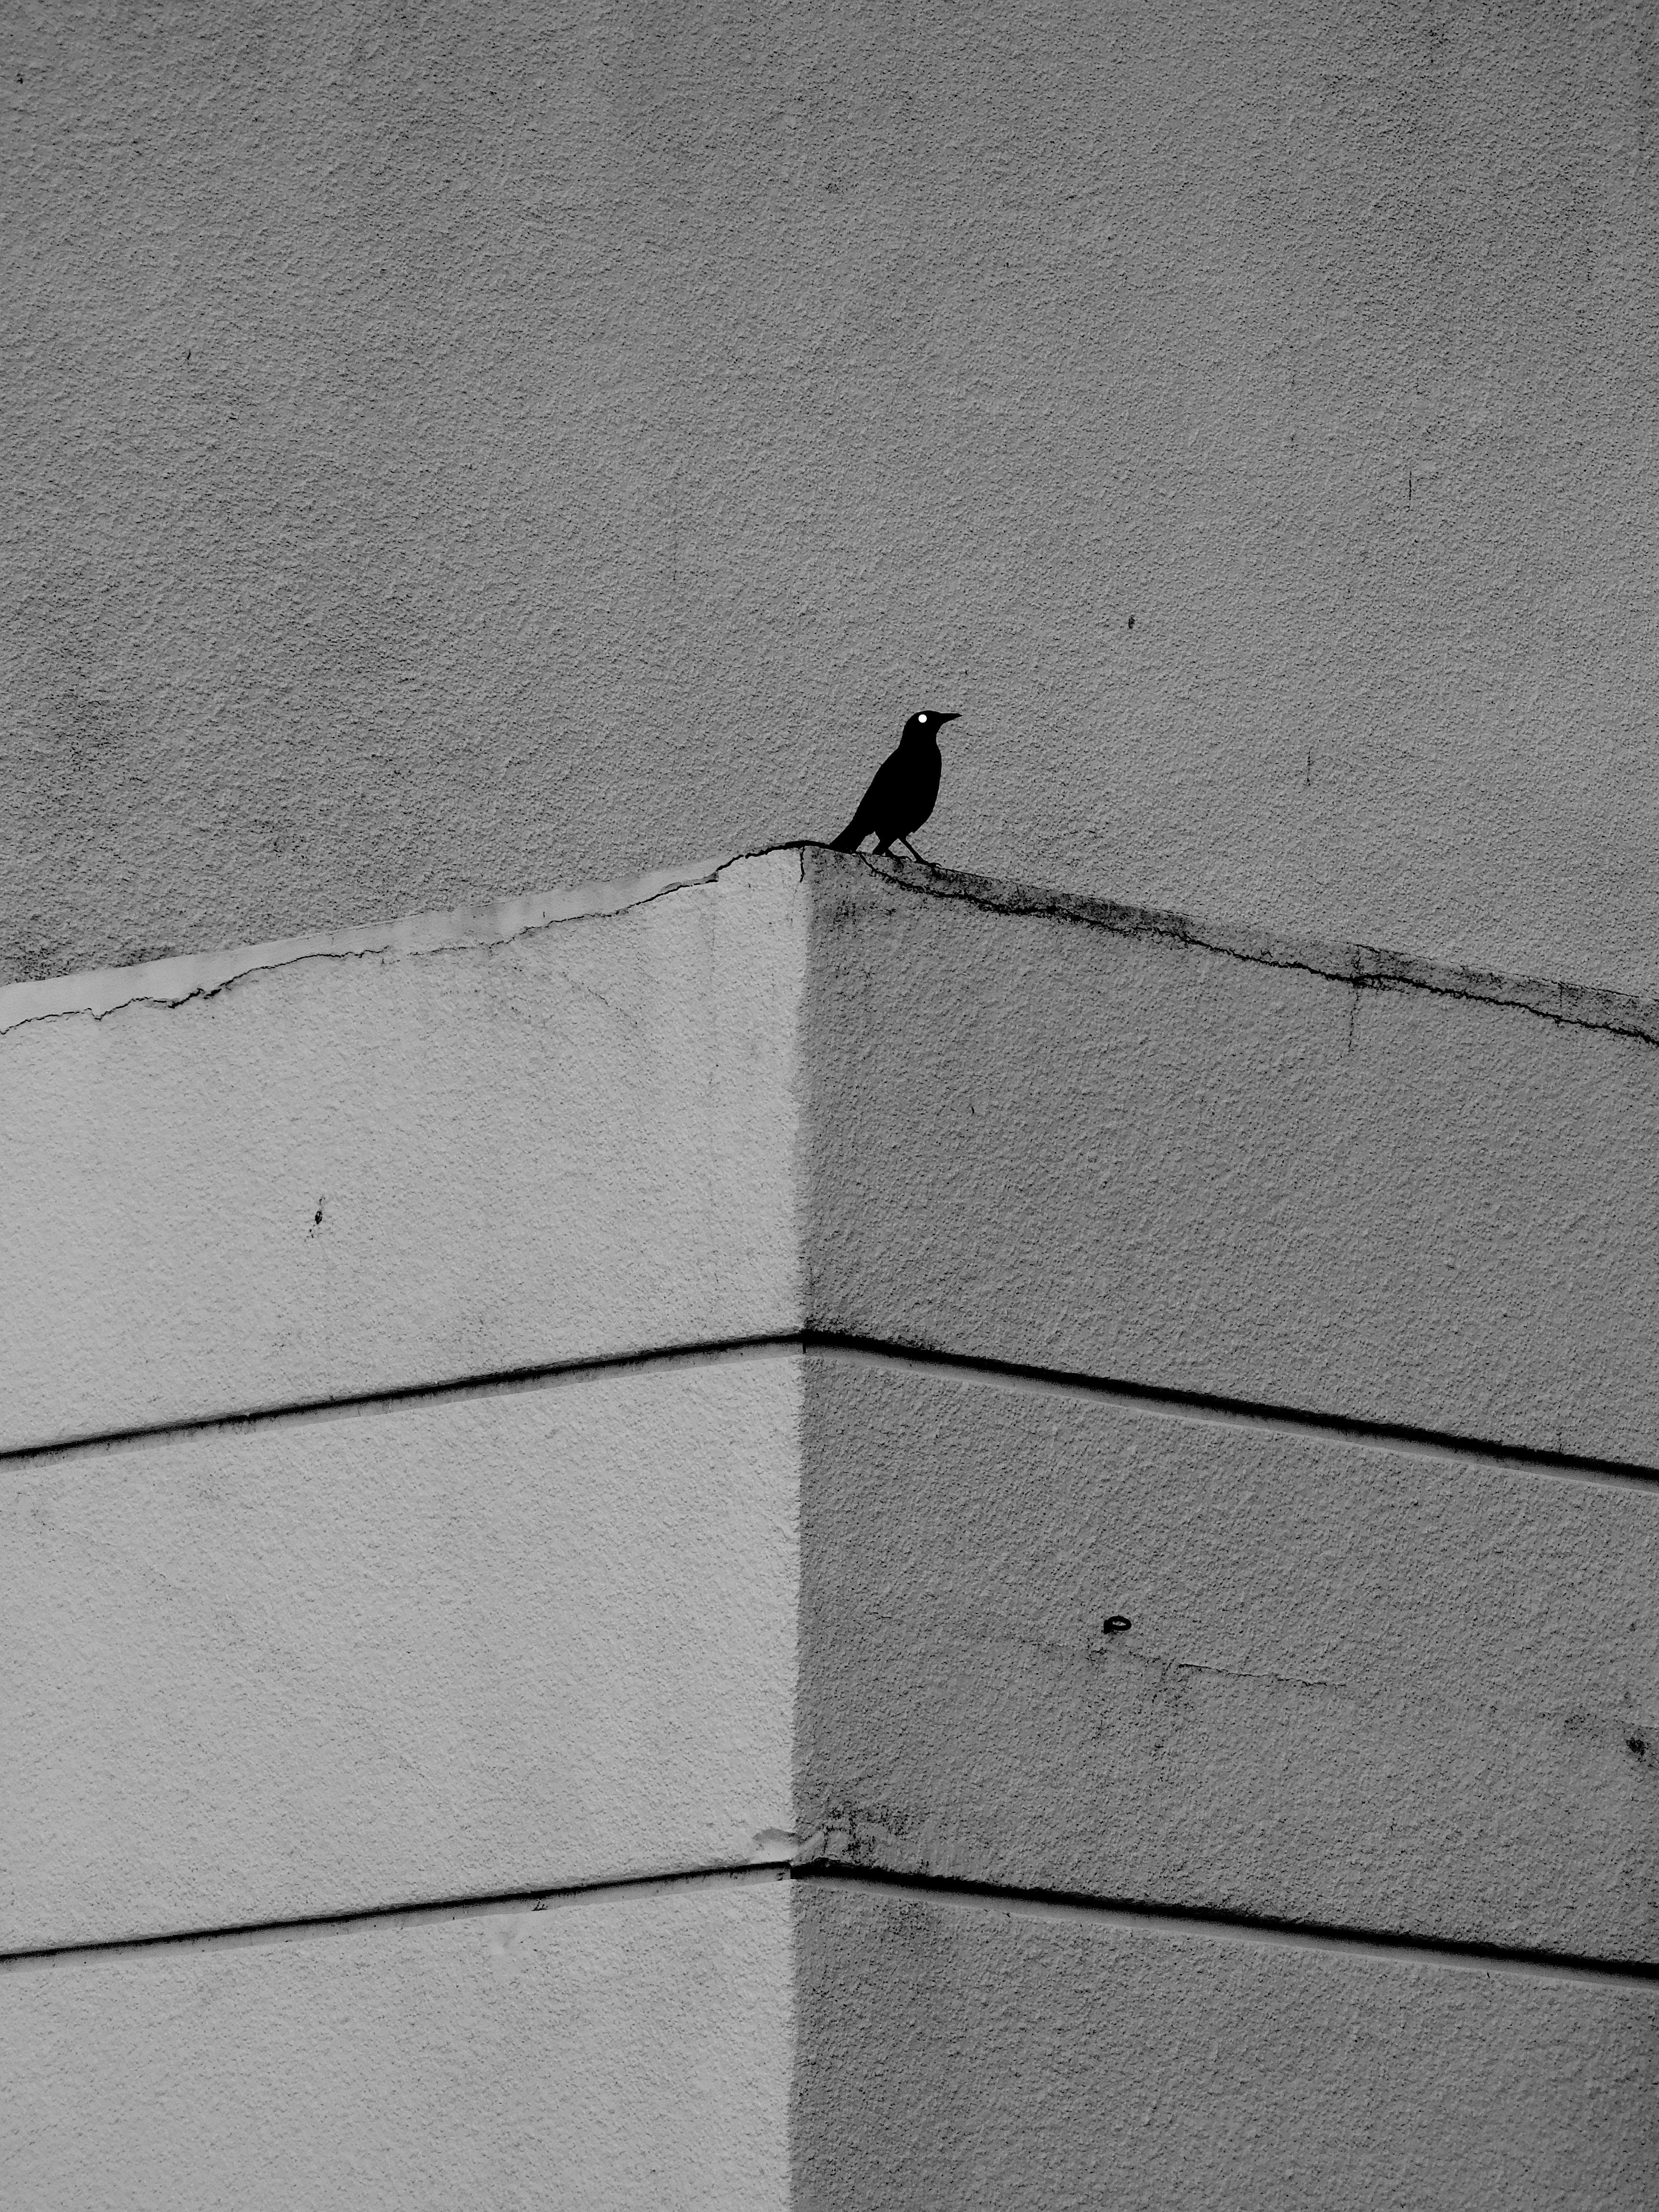 BirdOnTheLedge